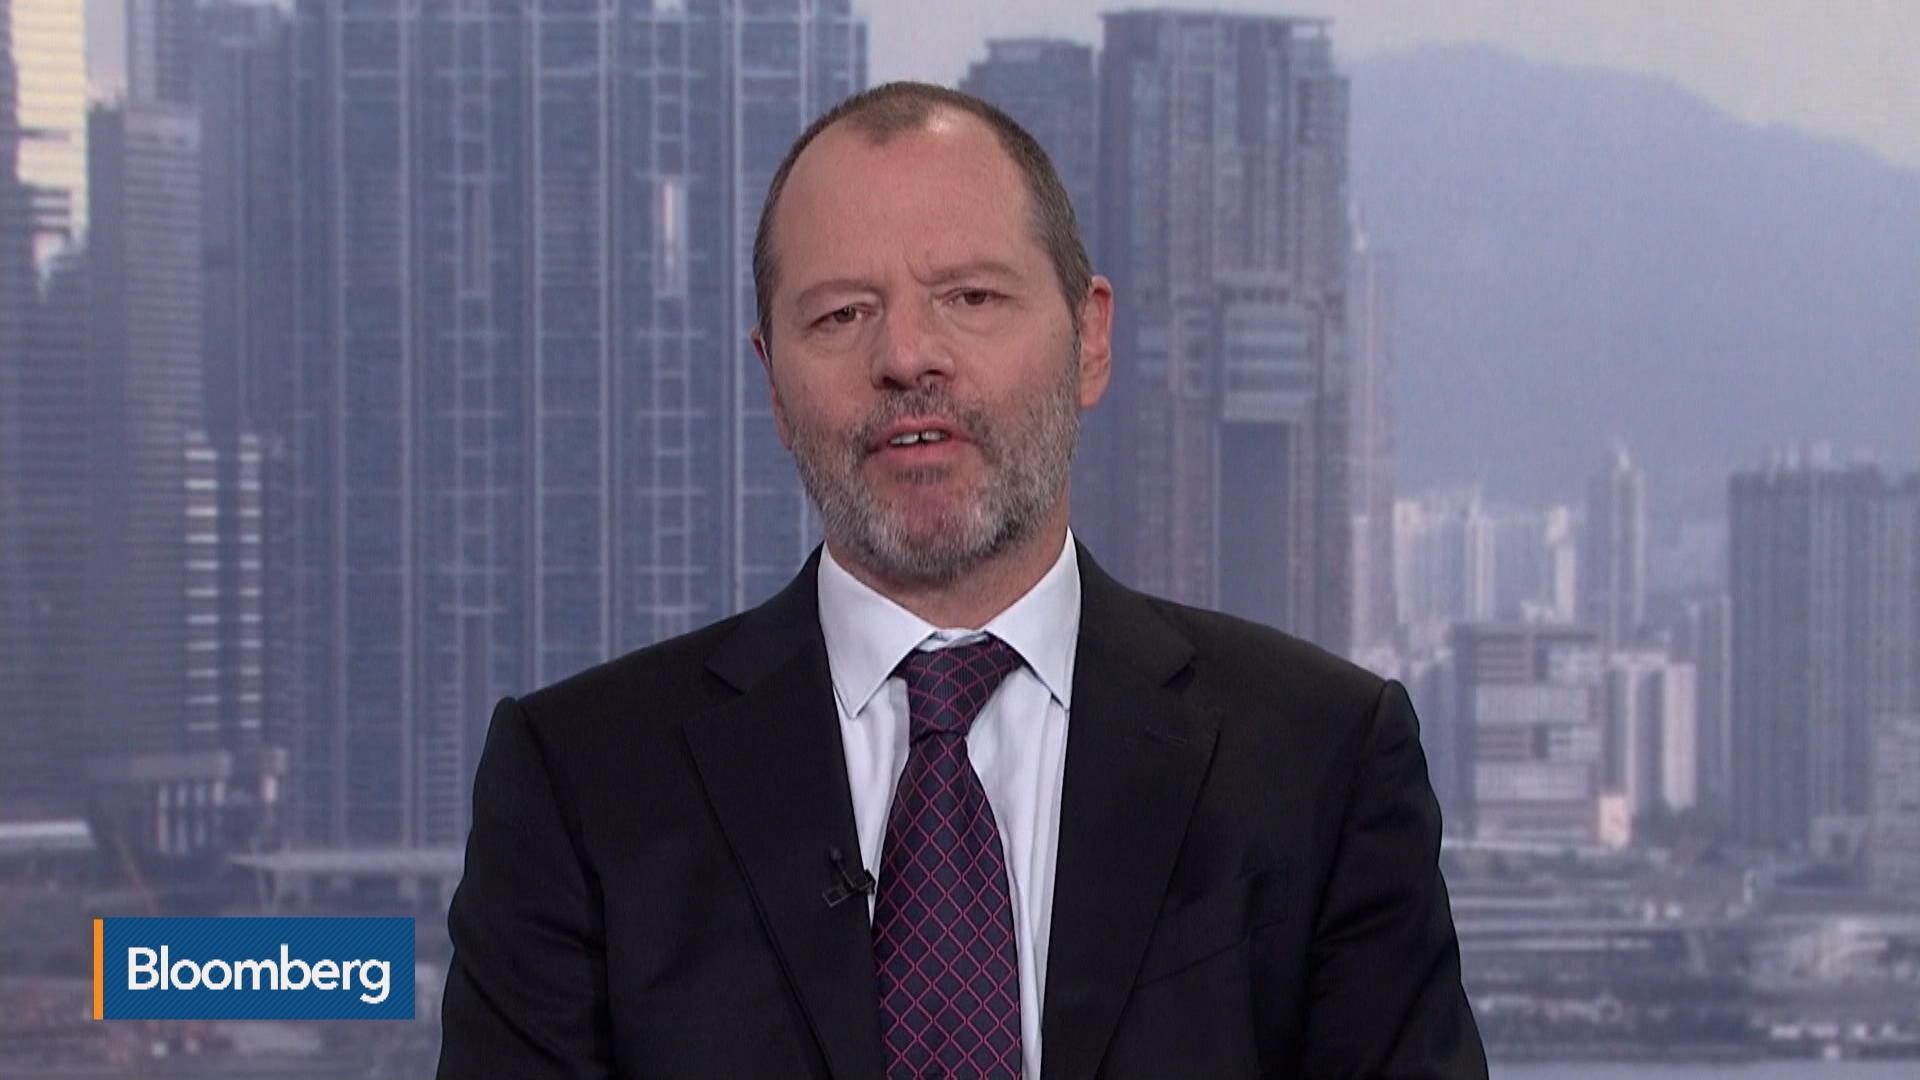 Jean-Marc Lieberherr, CEO of Diamond Producers Association, on Market Outlook